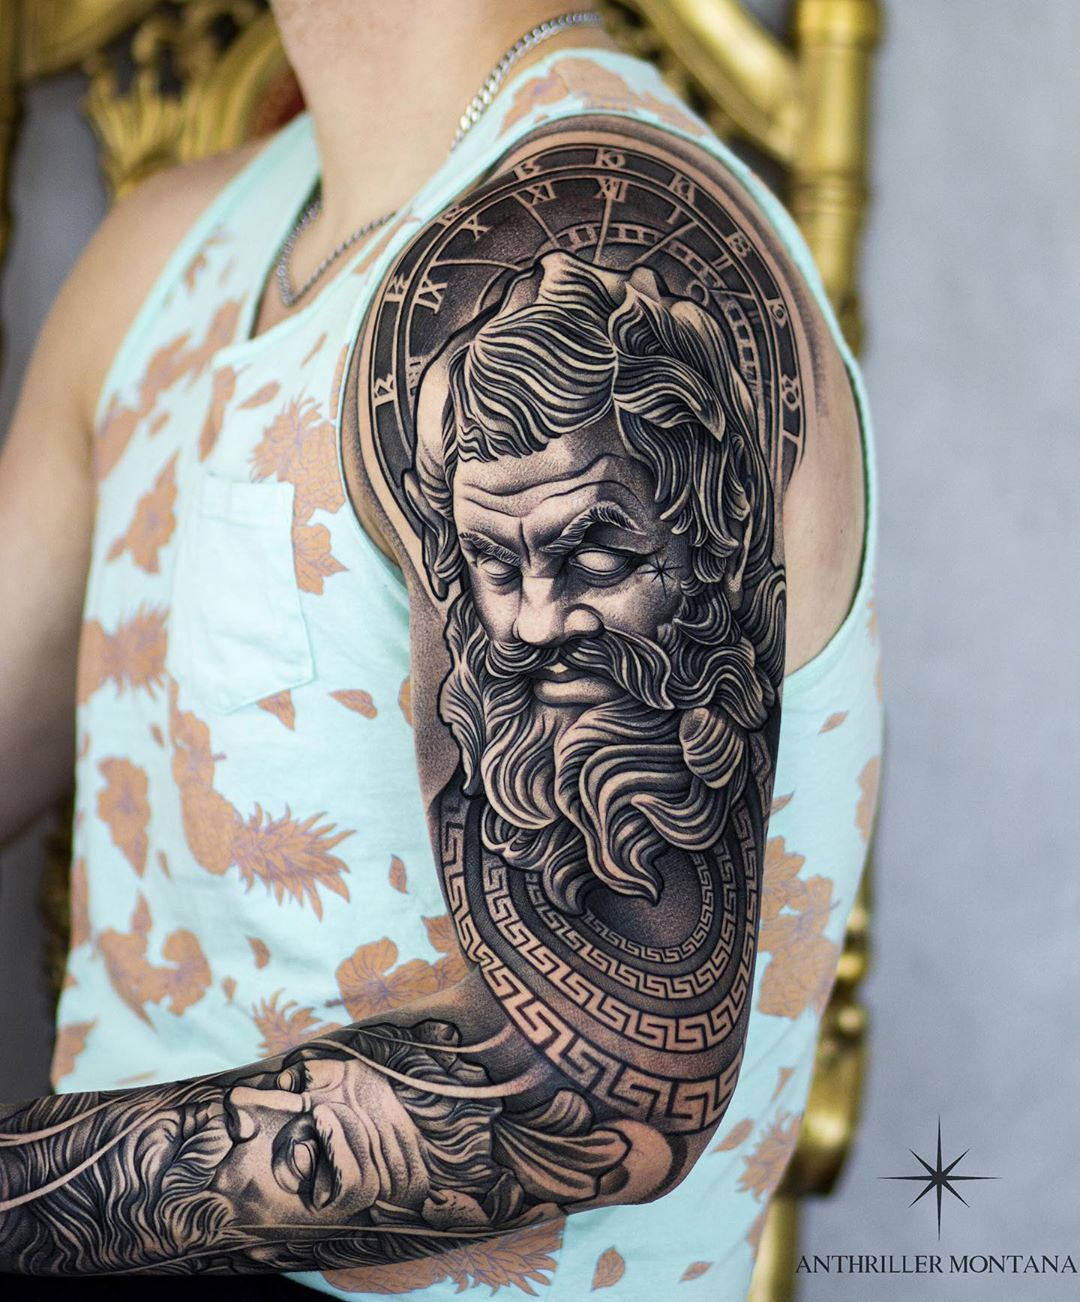 6 571 Likes 59 Comments Anthriller Montana Anthriller Montana On Instagram Denmark January 13 17 In 2020 Greek Tattoos Poseidon Tattoo Mythology Tattoos